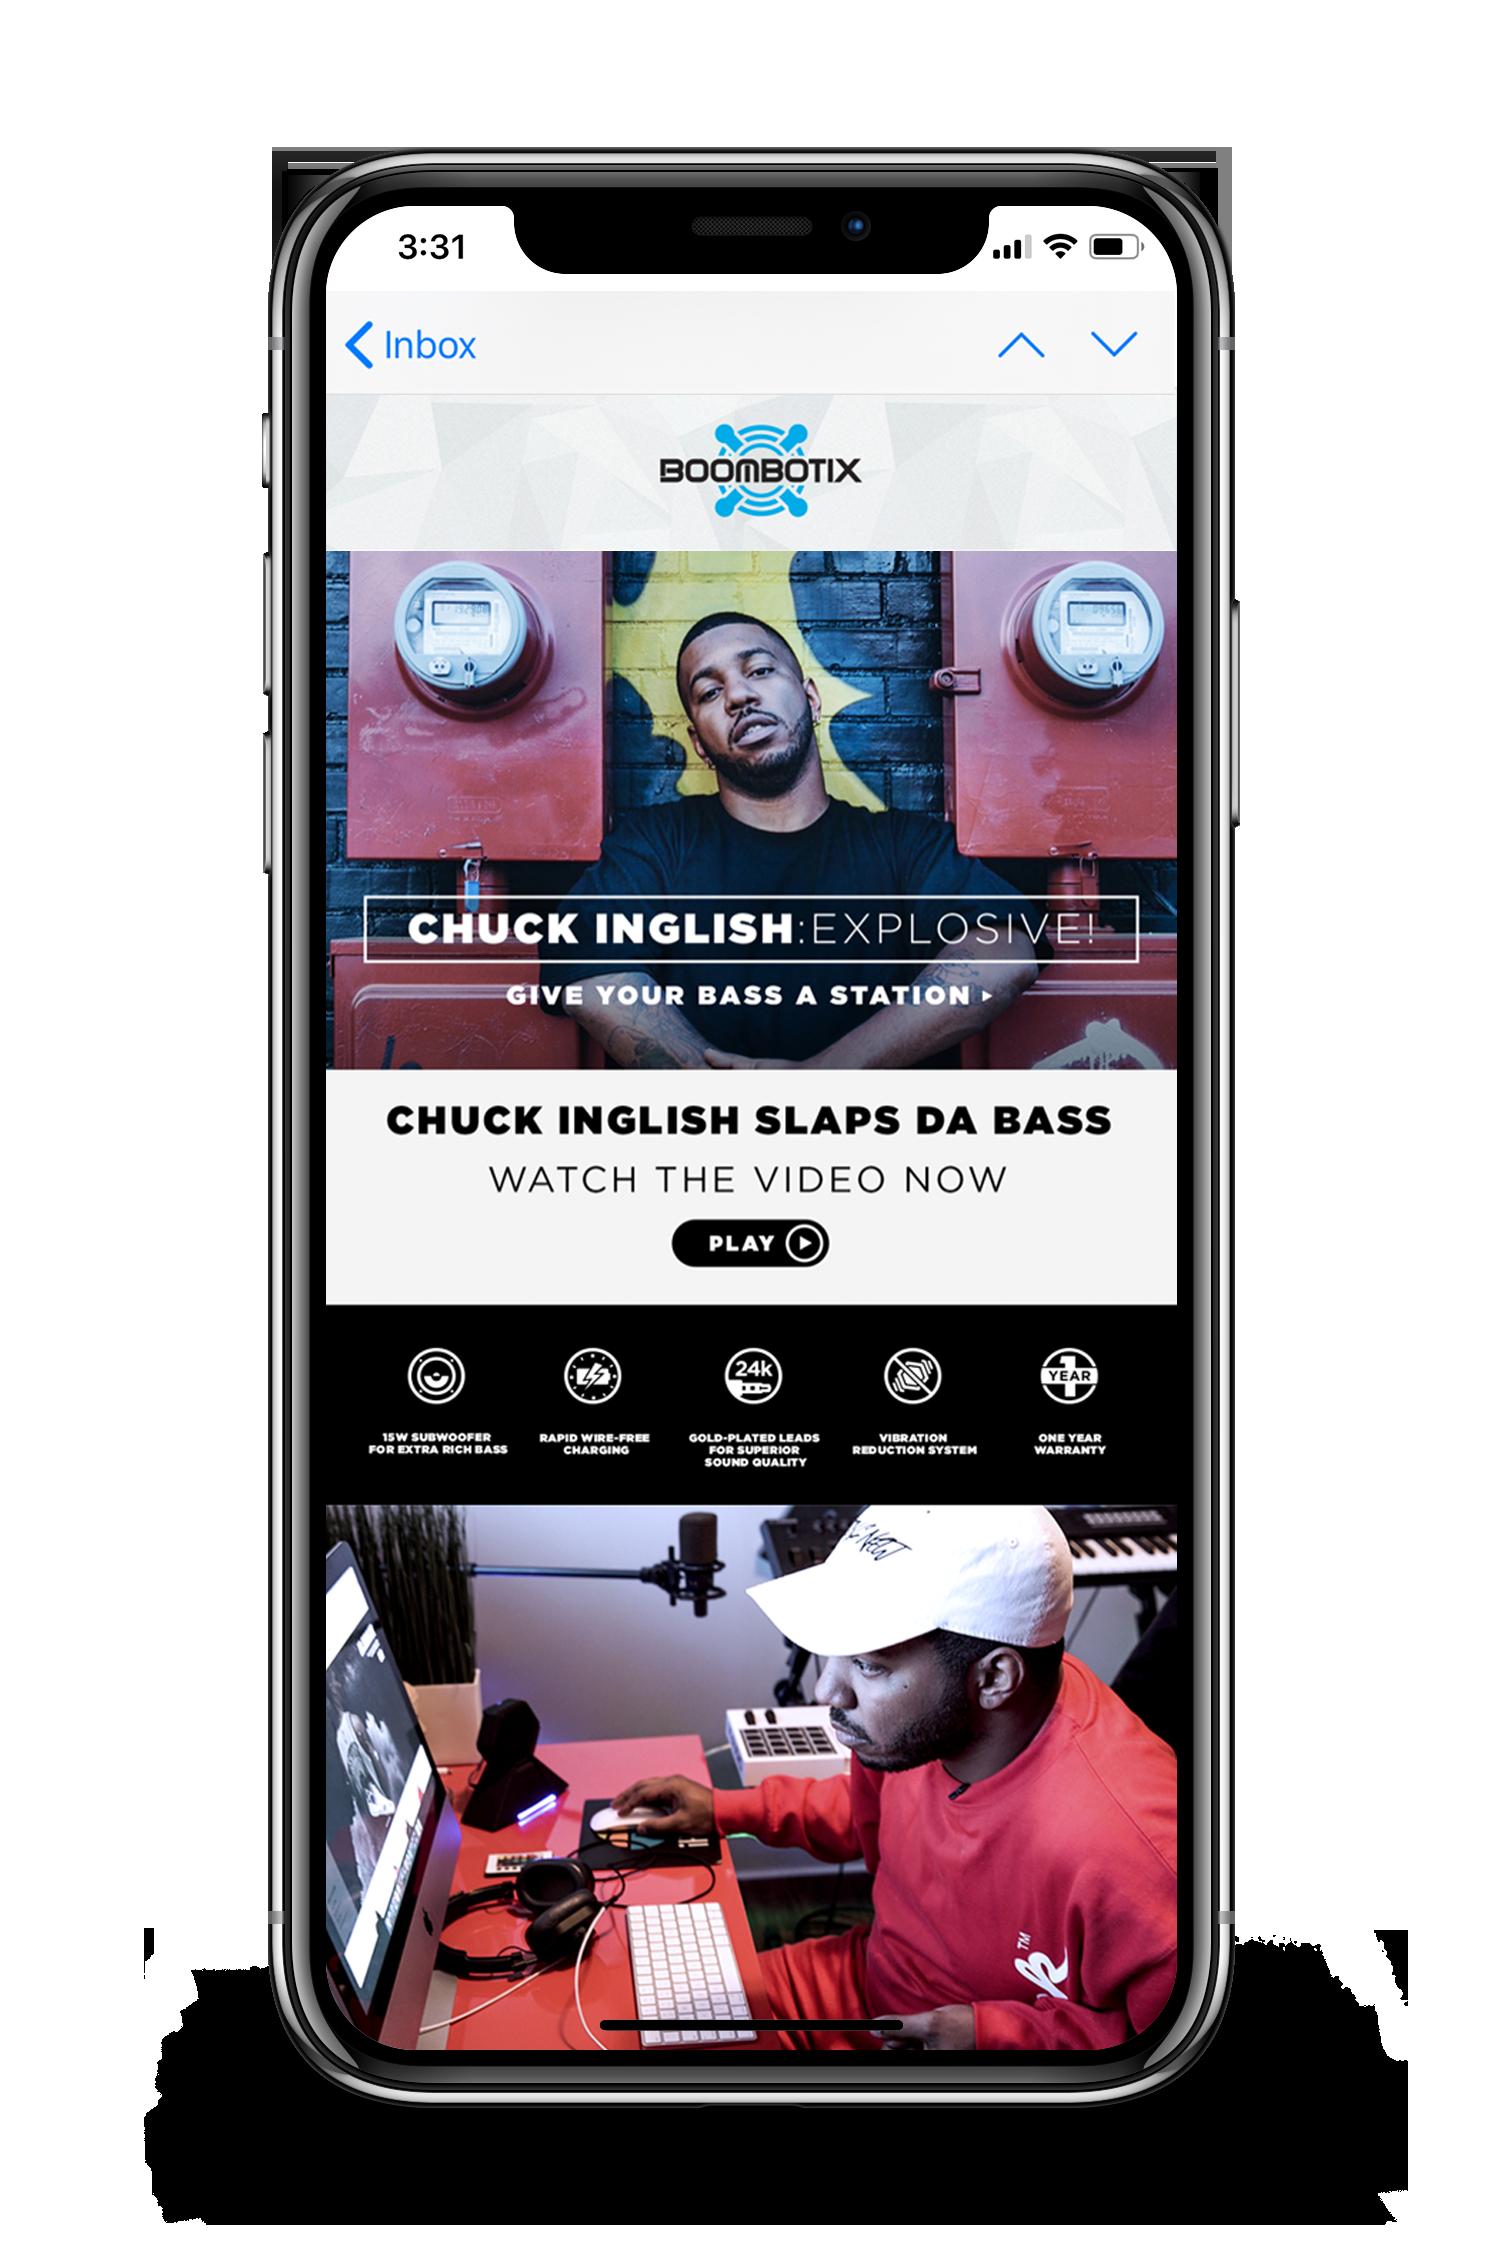 Boombotix website chuck english video being displayed on smartphone